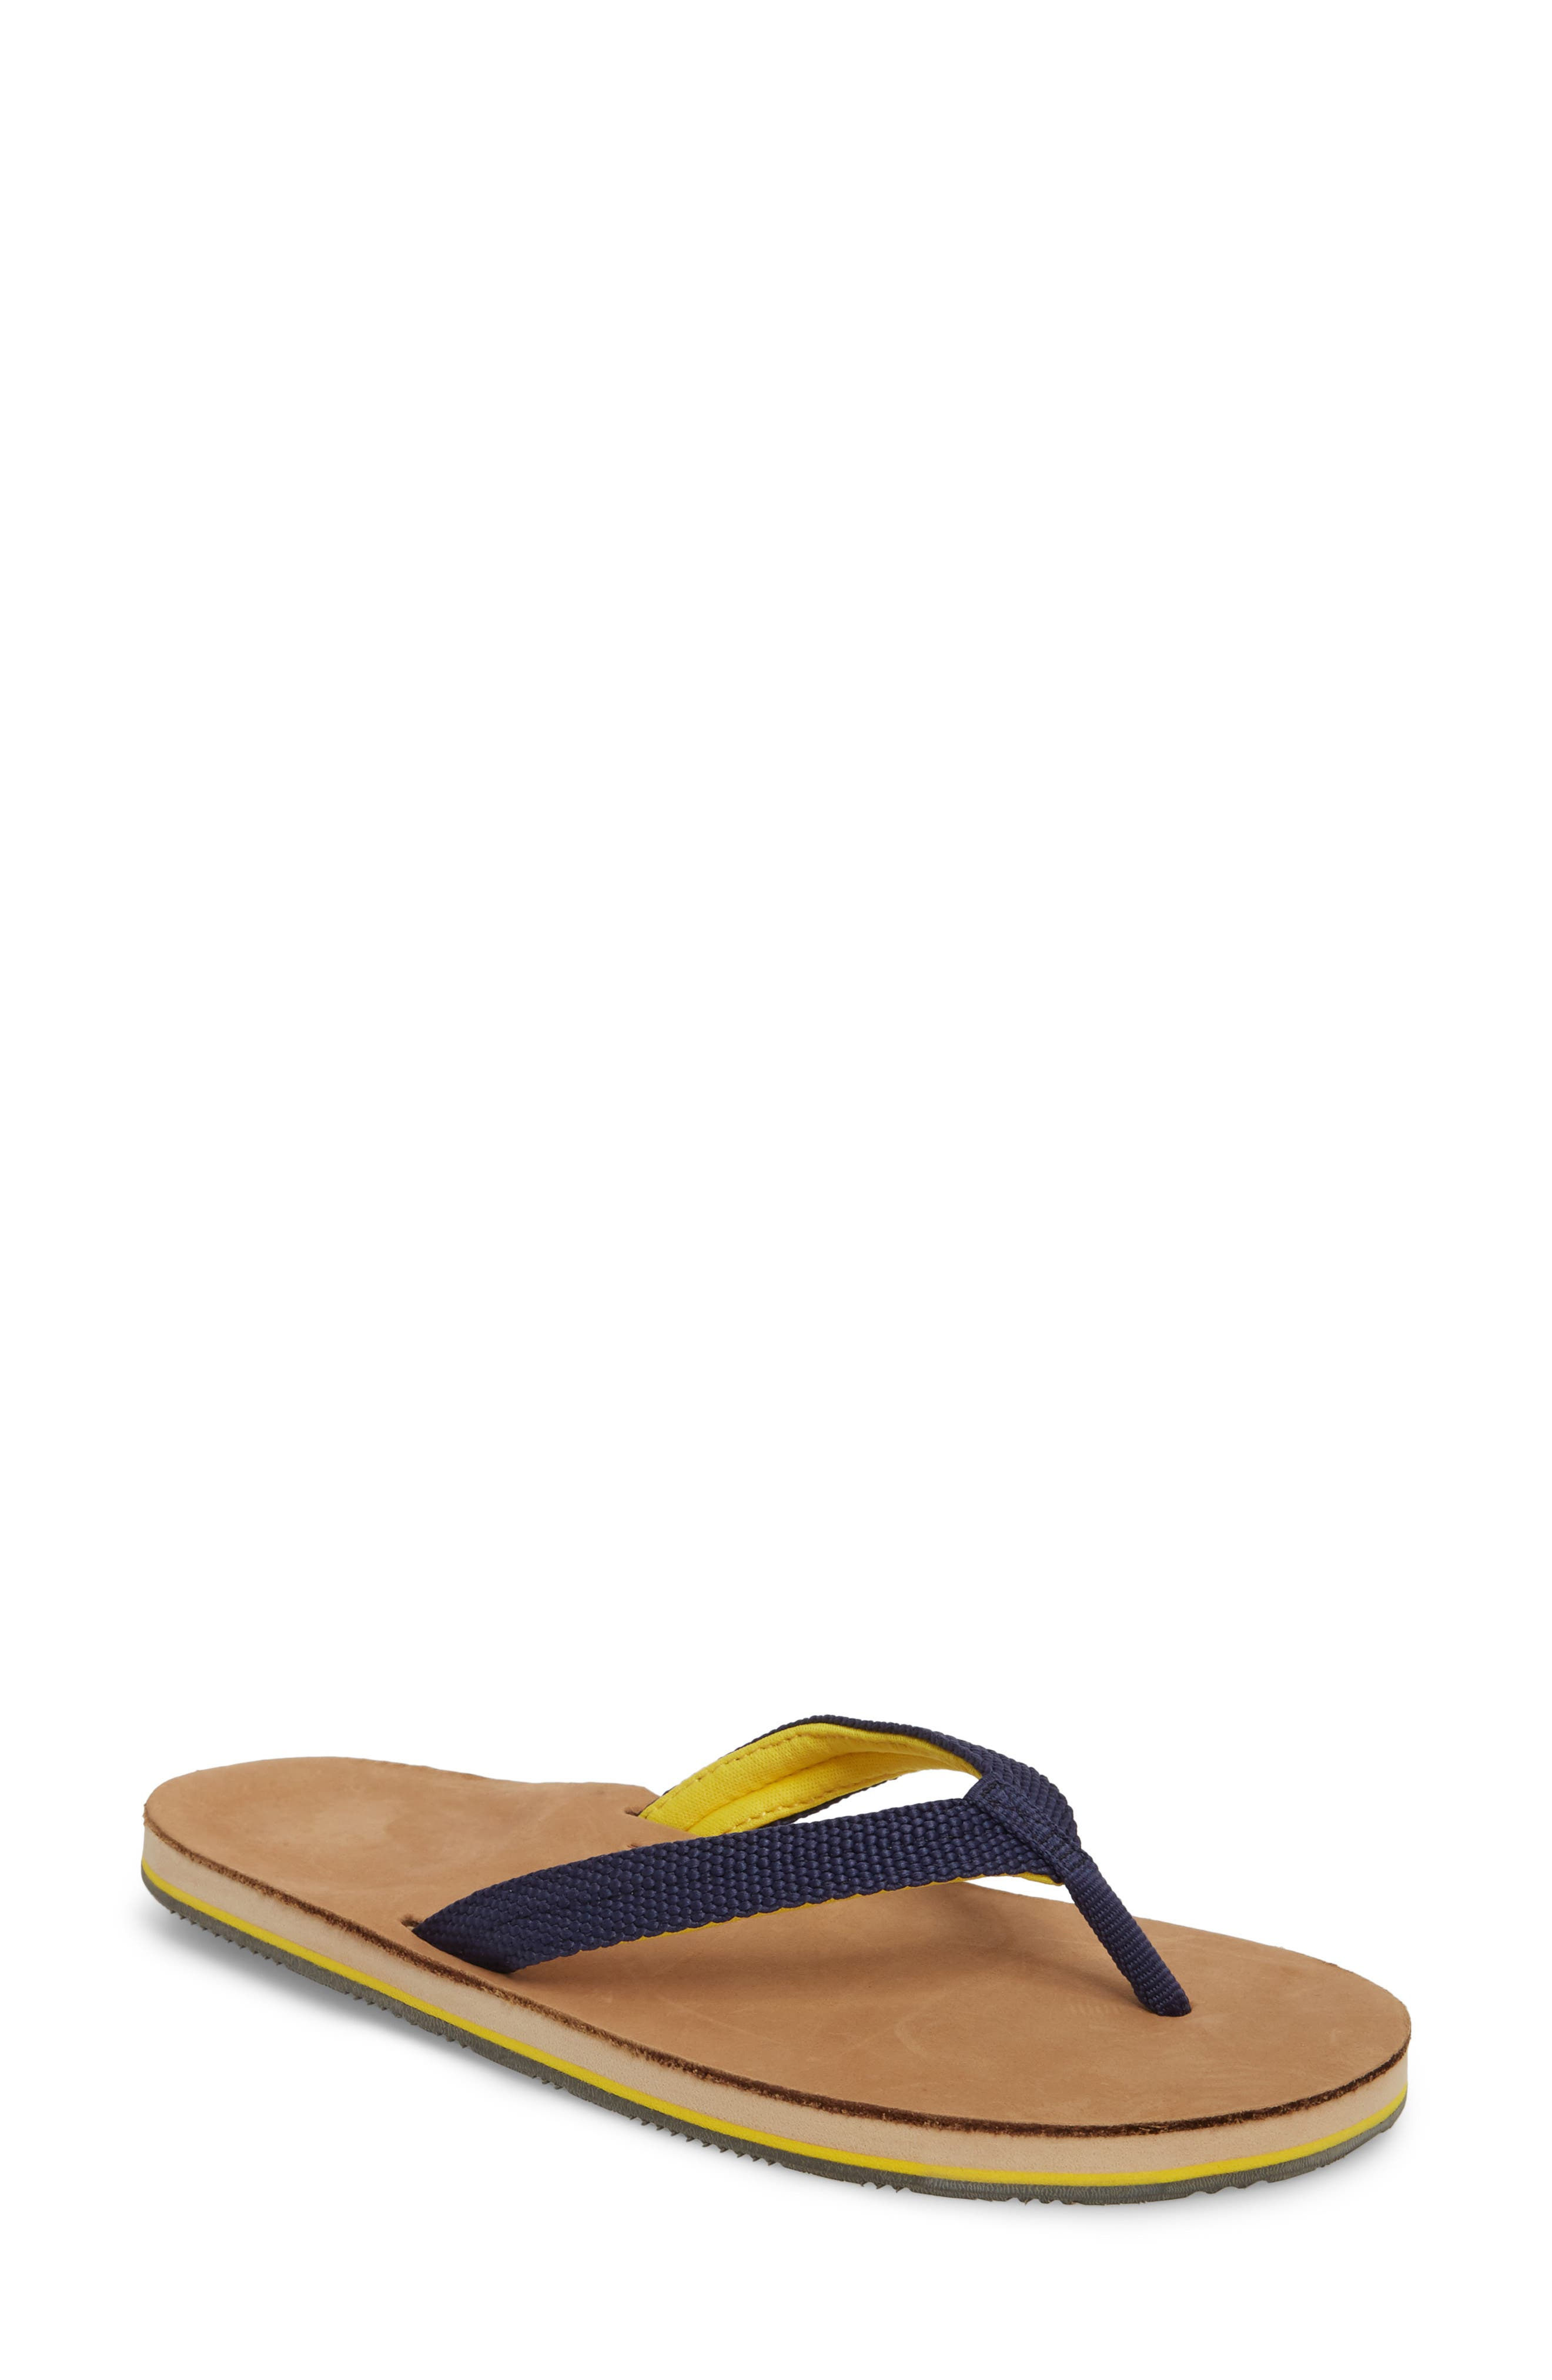 Scouts Flip Flop,                         Main,                         color, Navy Yellow